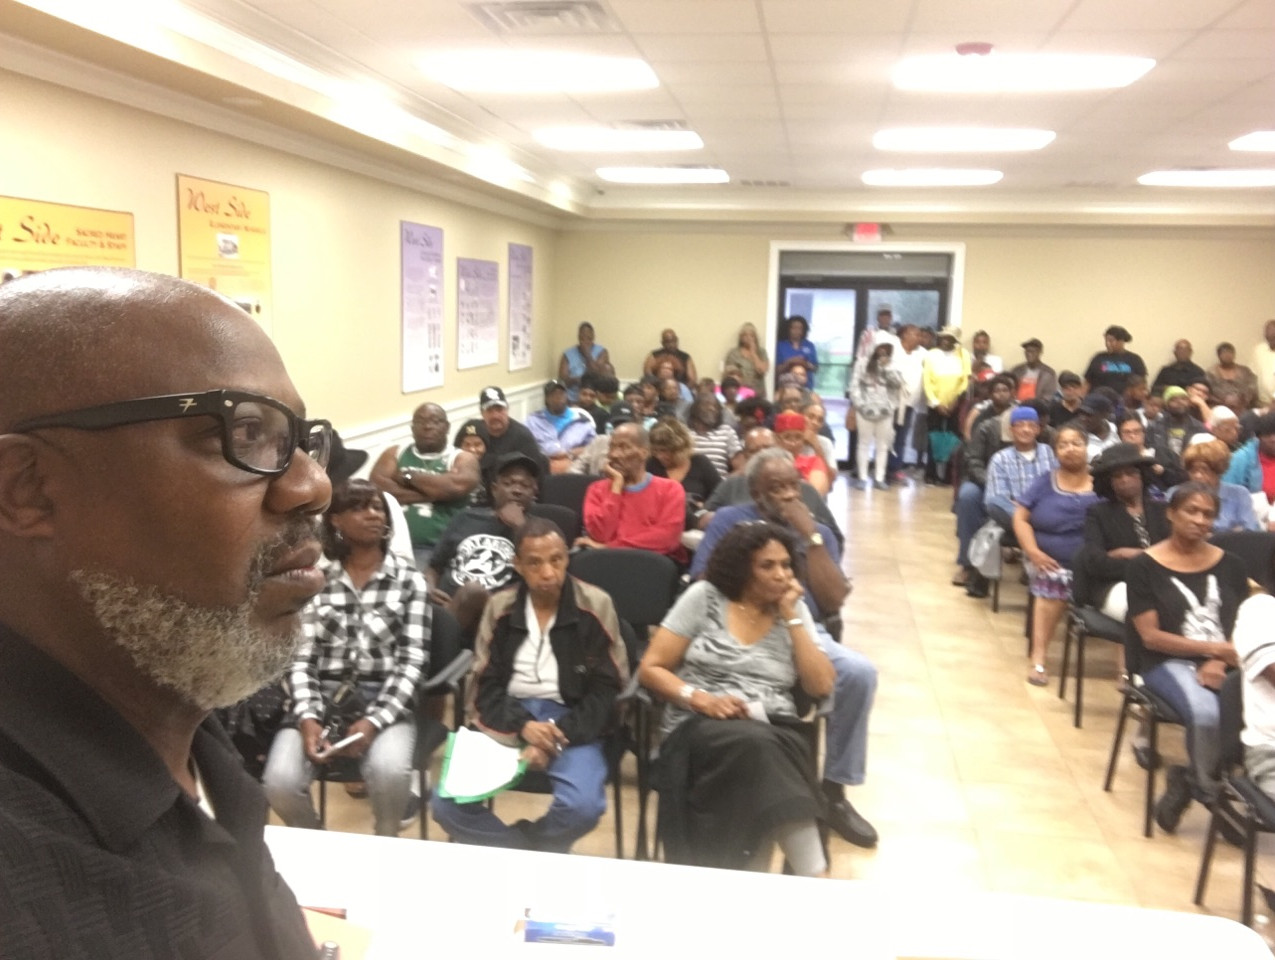 Hilton Kelley at community meeting